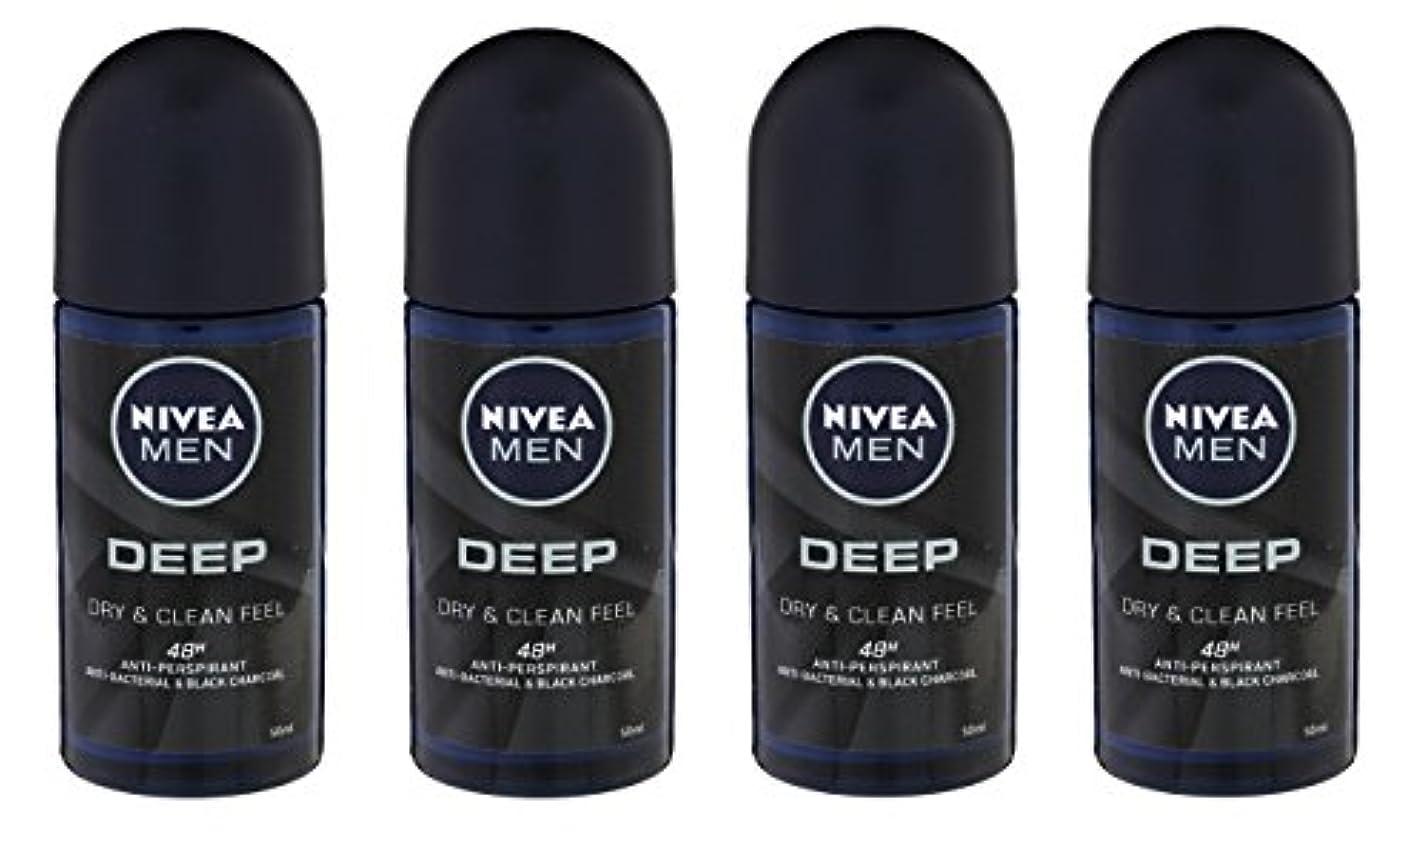 (Pack of 4) Nivea Deep Anti-perspirant Deodorant Roll On for Men 50ml - (4パック) ニベア深い制汗剤デオドラントロールオン男性用50ml